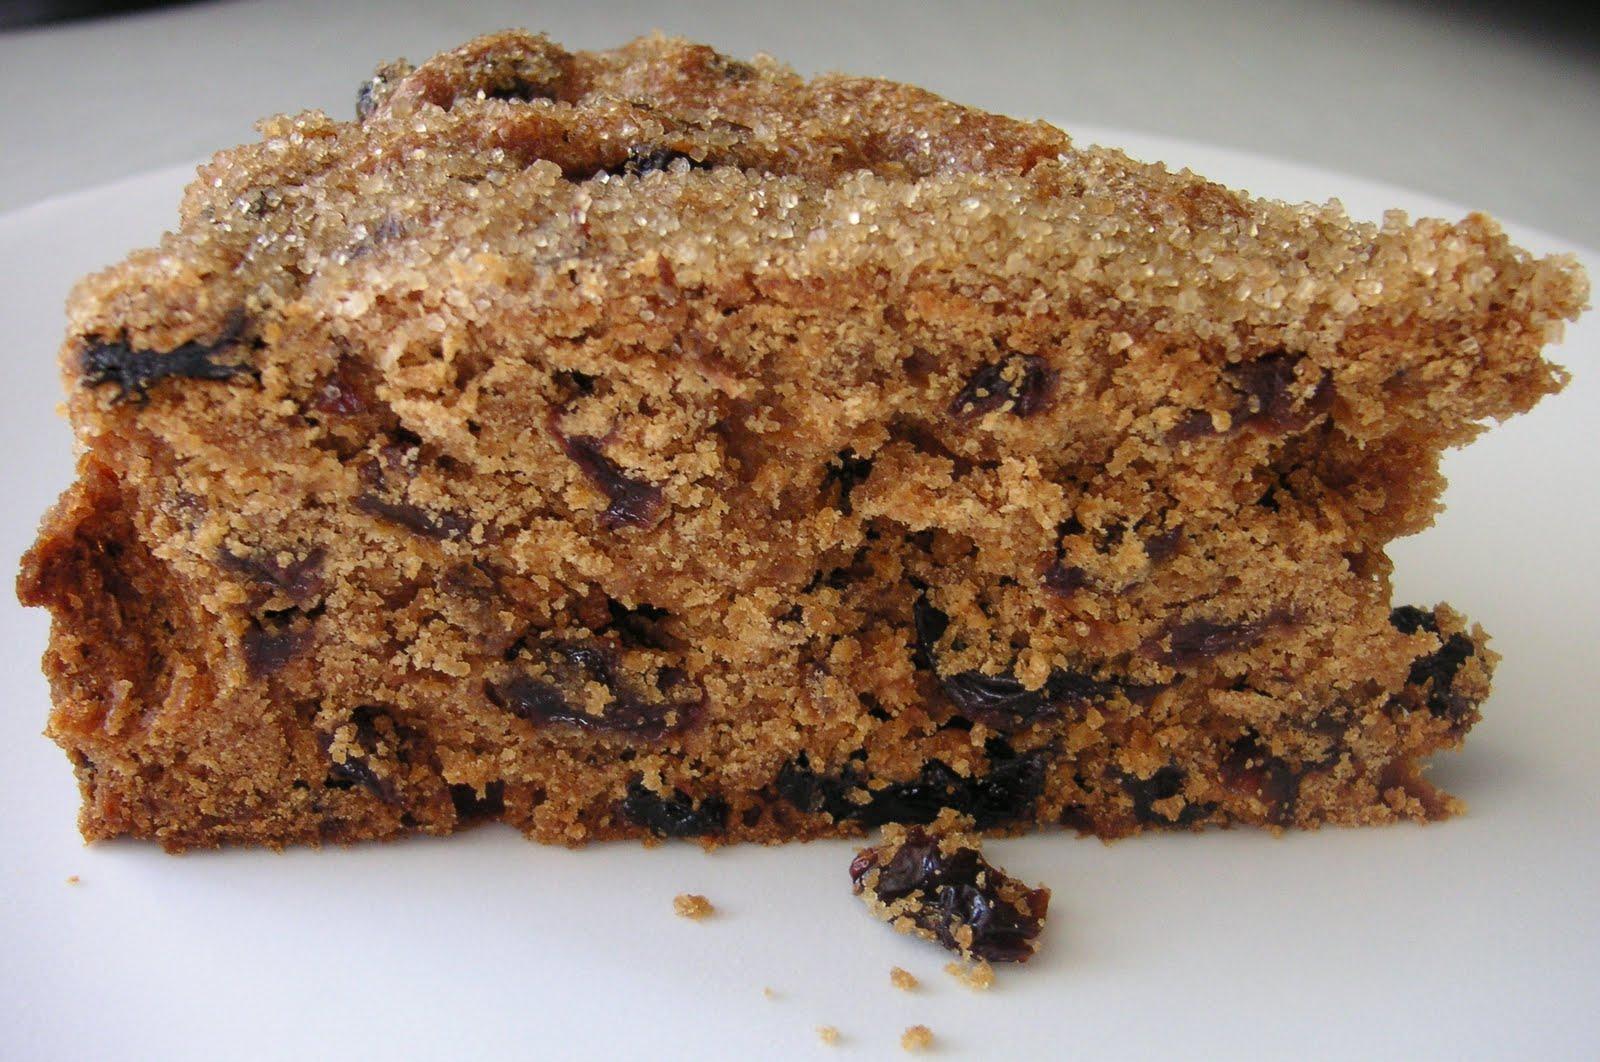 Manor house fruit cake recipe